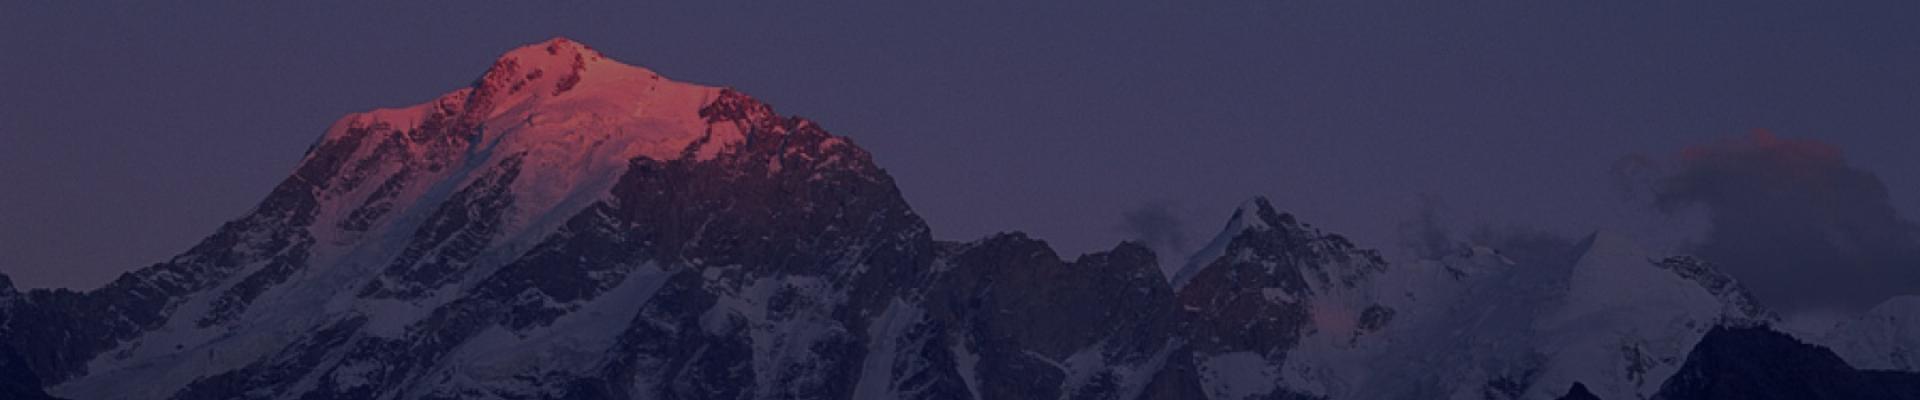 Adventure things to do in Bir Billing, Himachal Pradesh, India